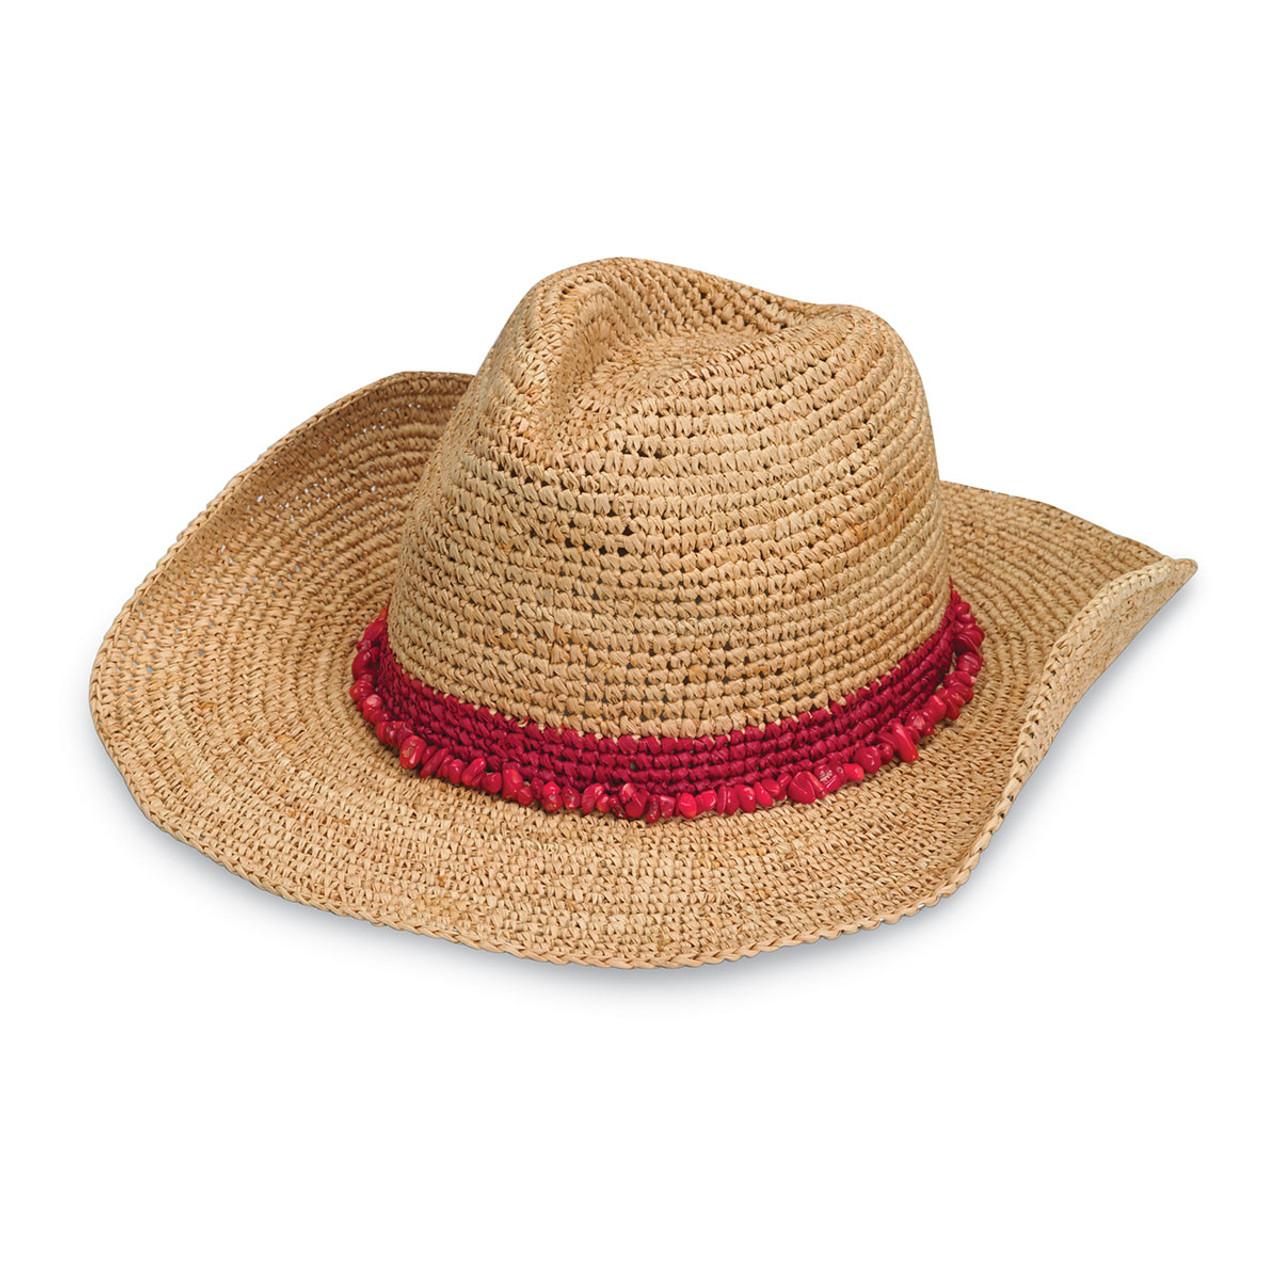 68c0018b596a9 Wallaroo Women s Catalina Cowboy Sun Hat